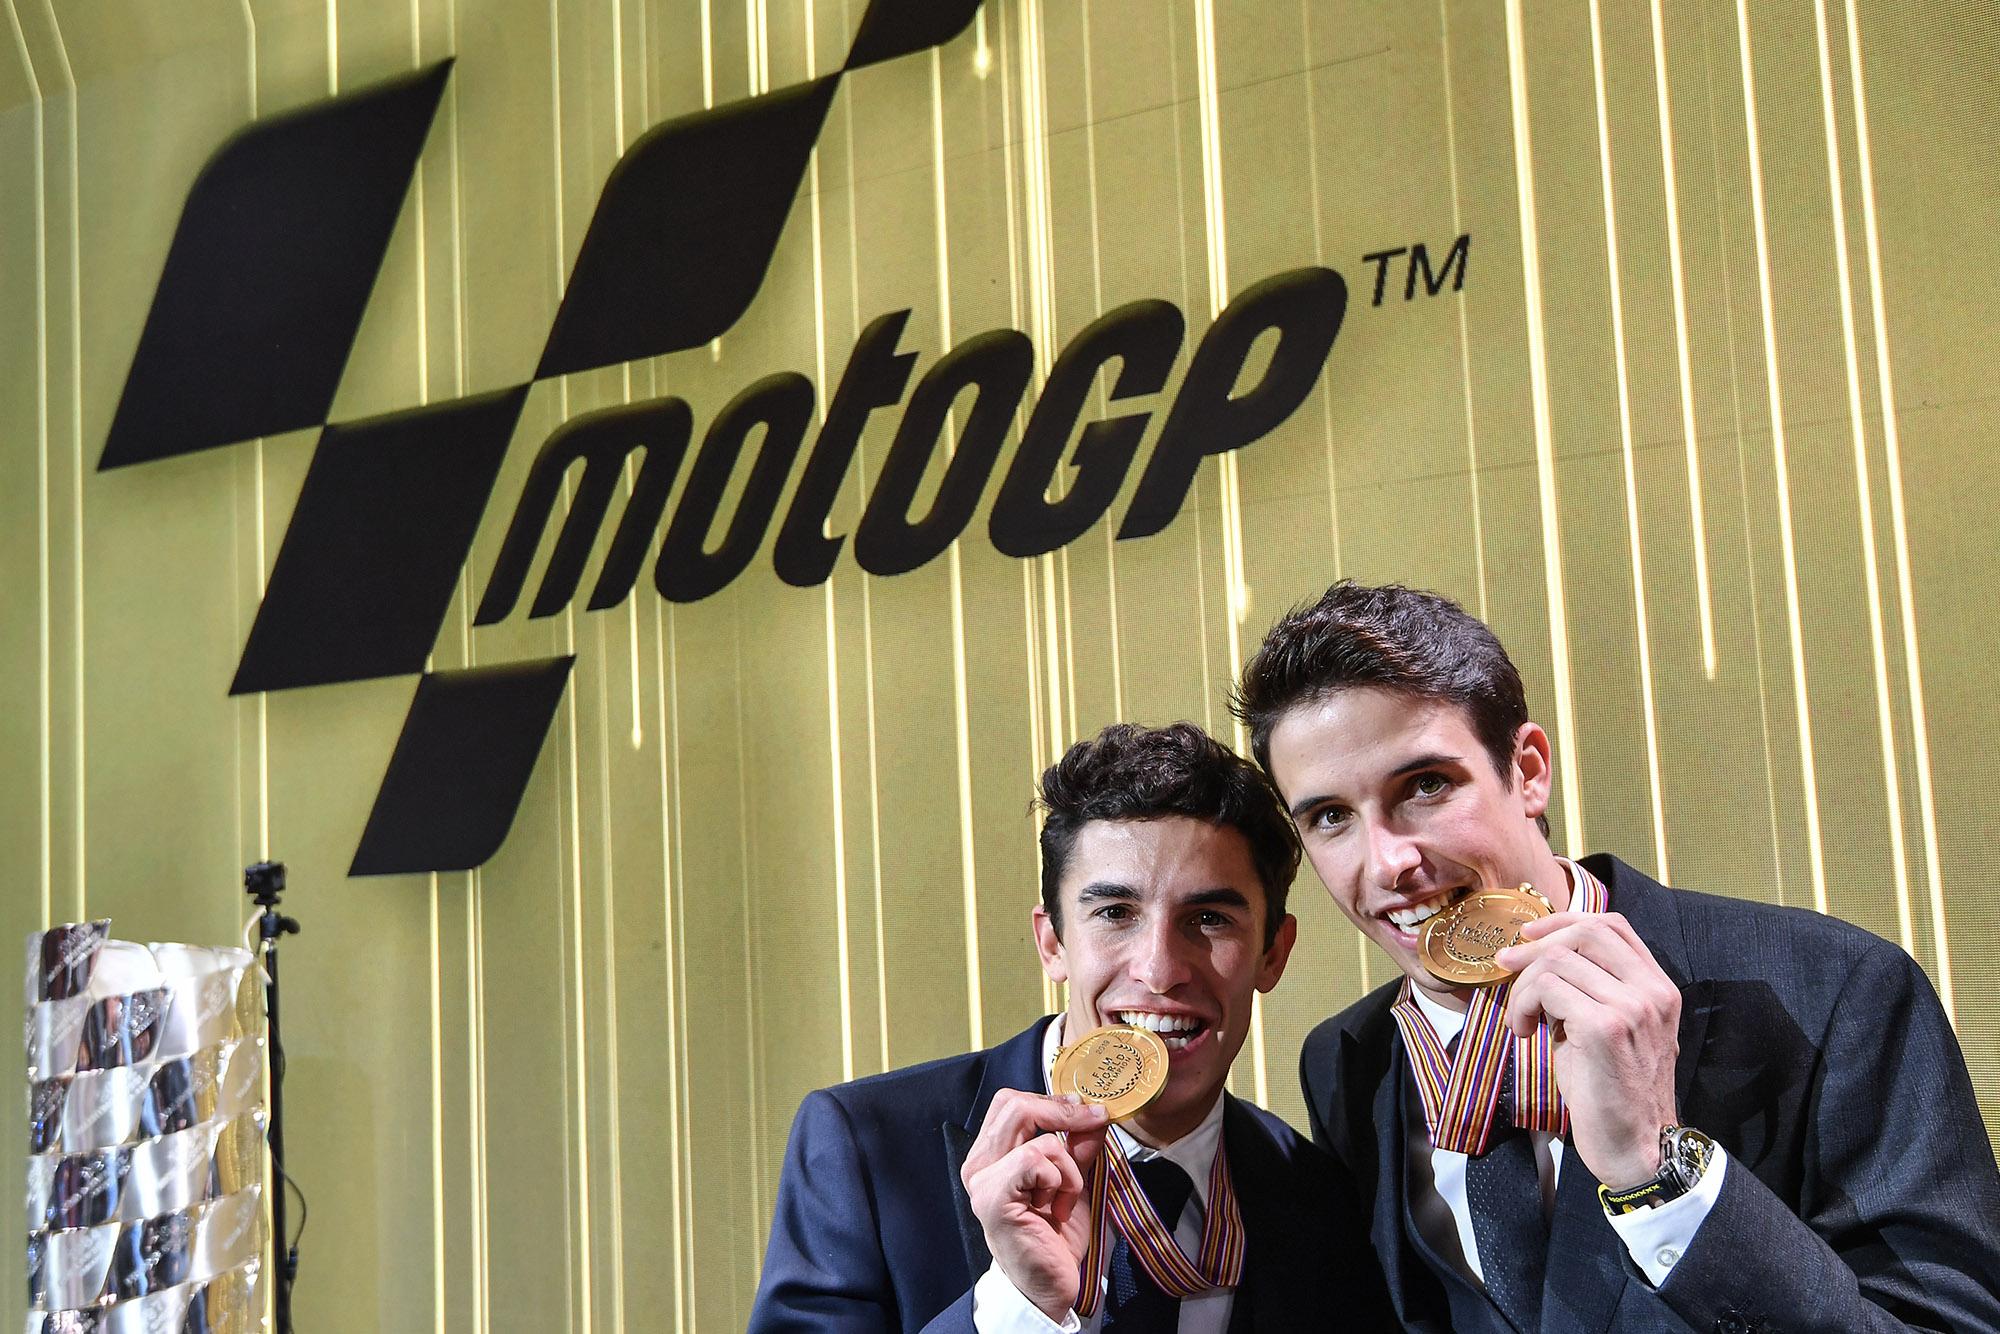 Marc Marquez and Alex Marquez bite their MotoGP and Moto2 championship medals for the camewras